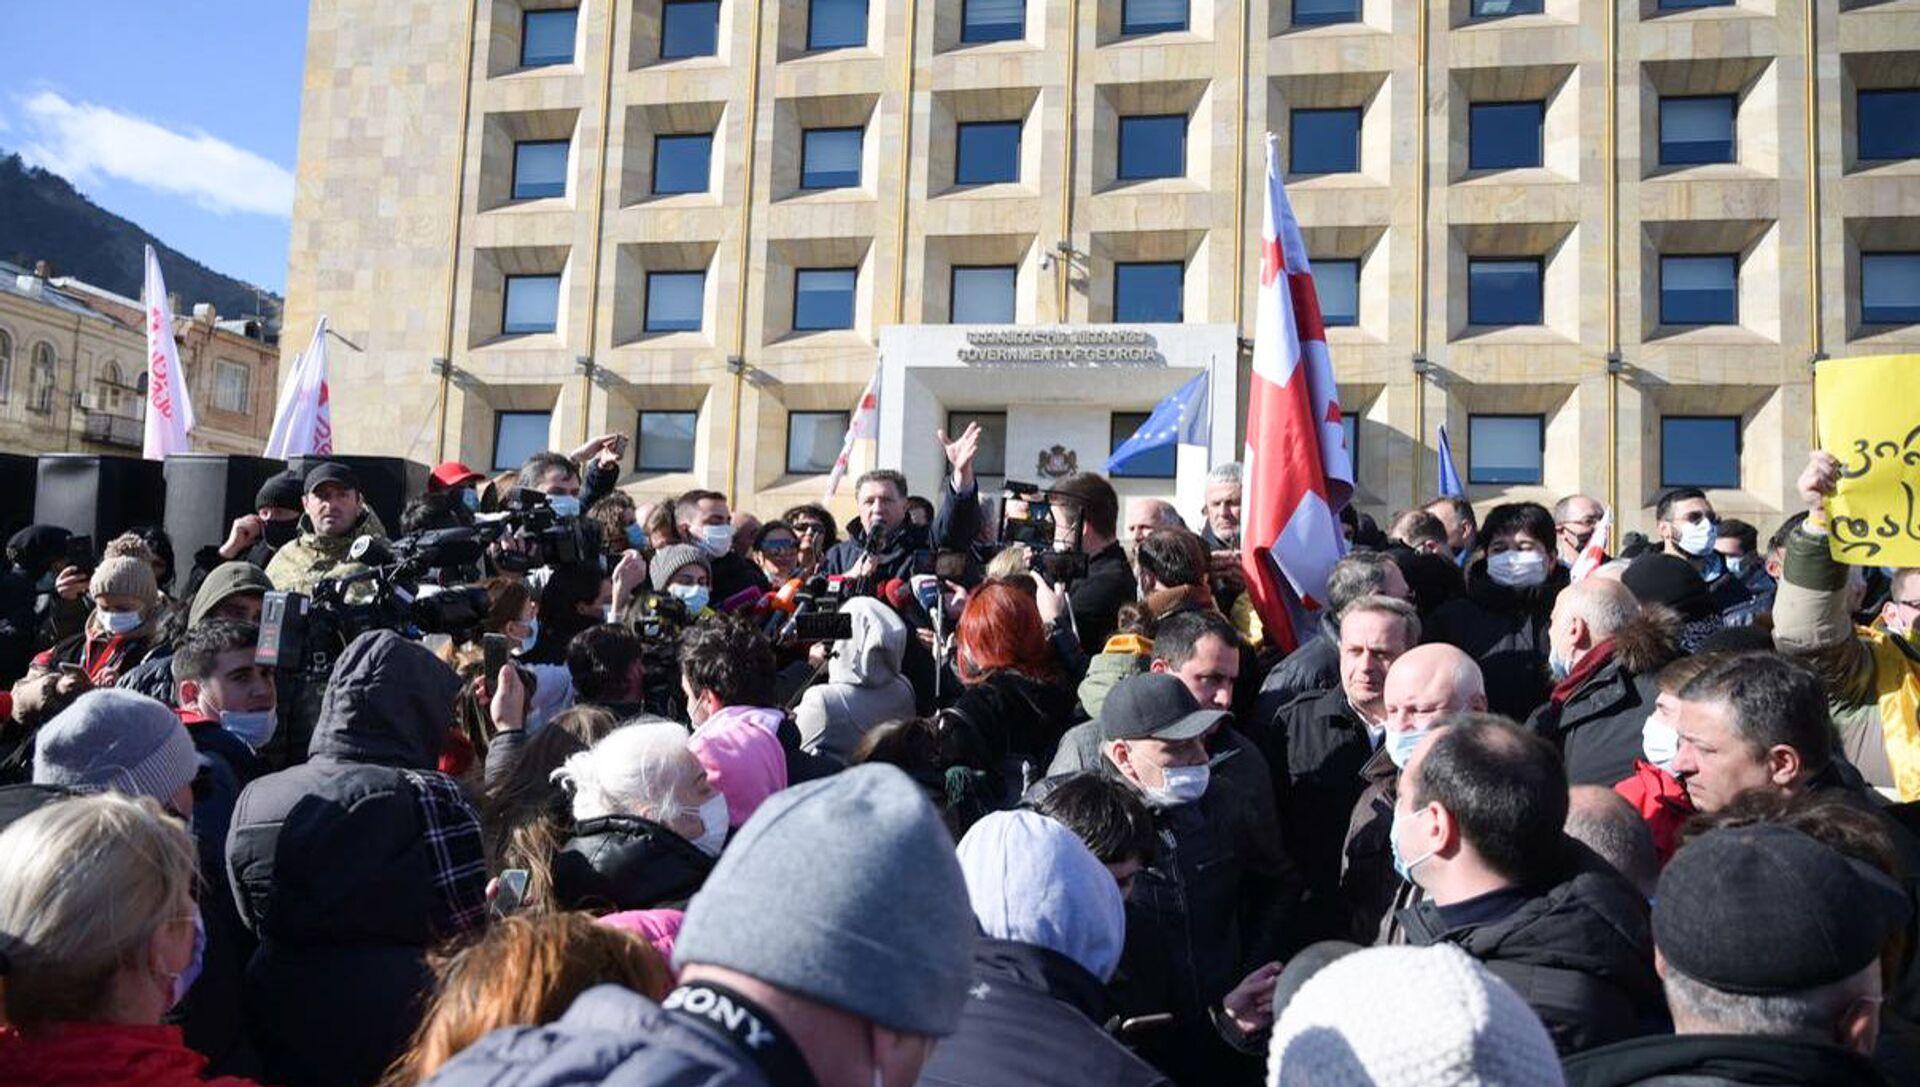 Tbilisi: Uhapšen opozicioni lider, protesti u centru grada /video/ - Sputnik Srbija, 1920, 23.02.2021